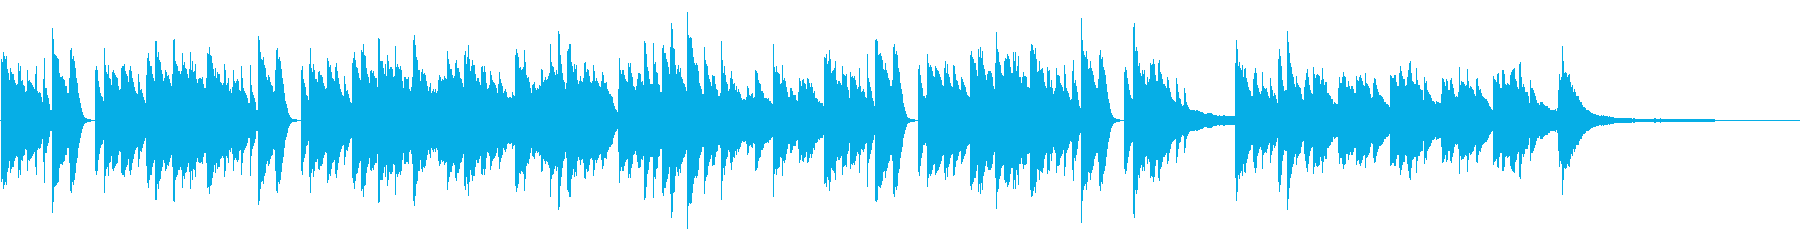 SNS広告 ピアノメイン 安らかの再生済みの波形